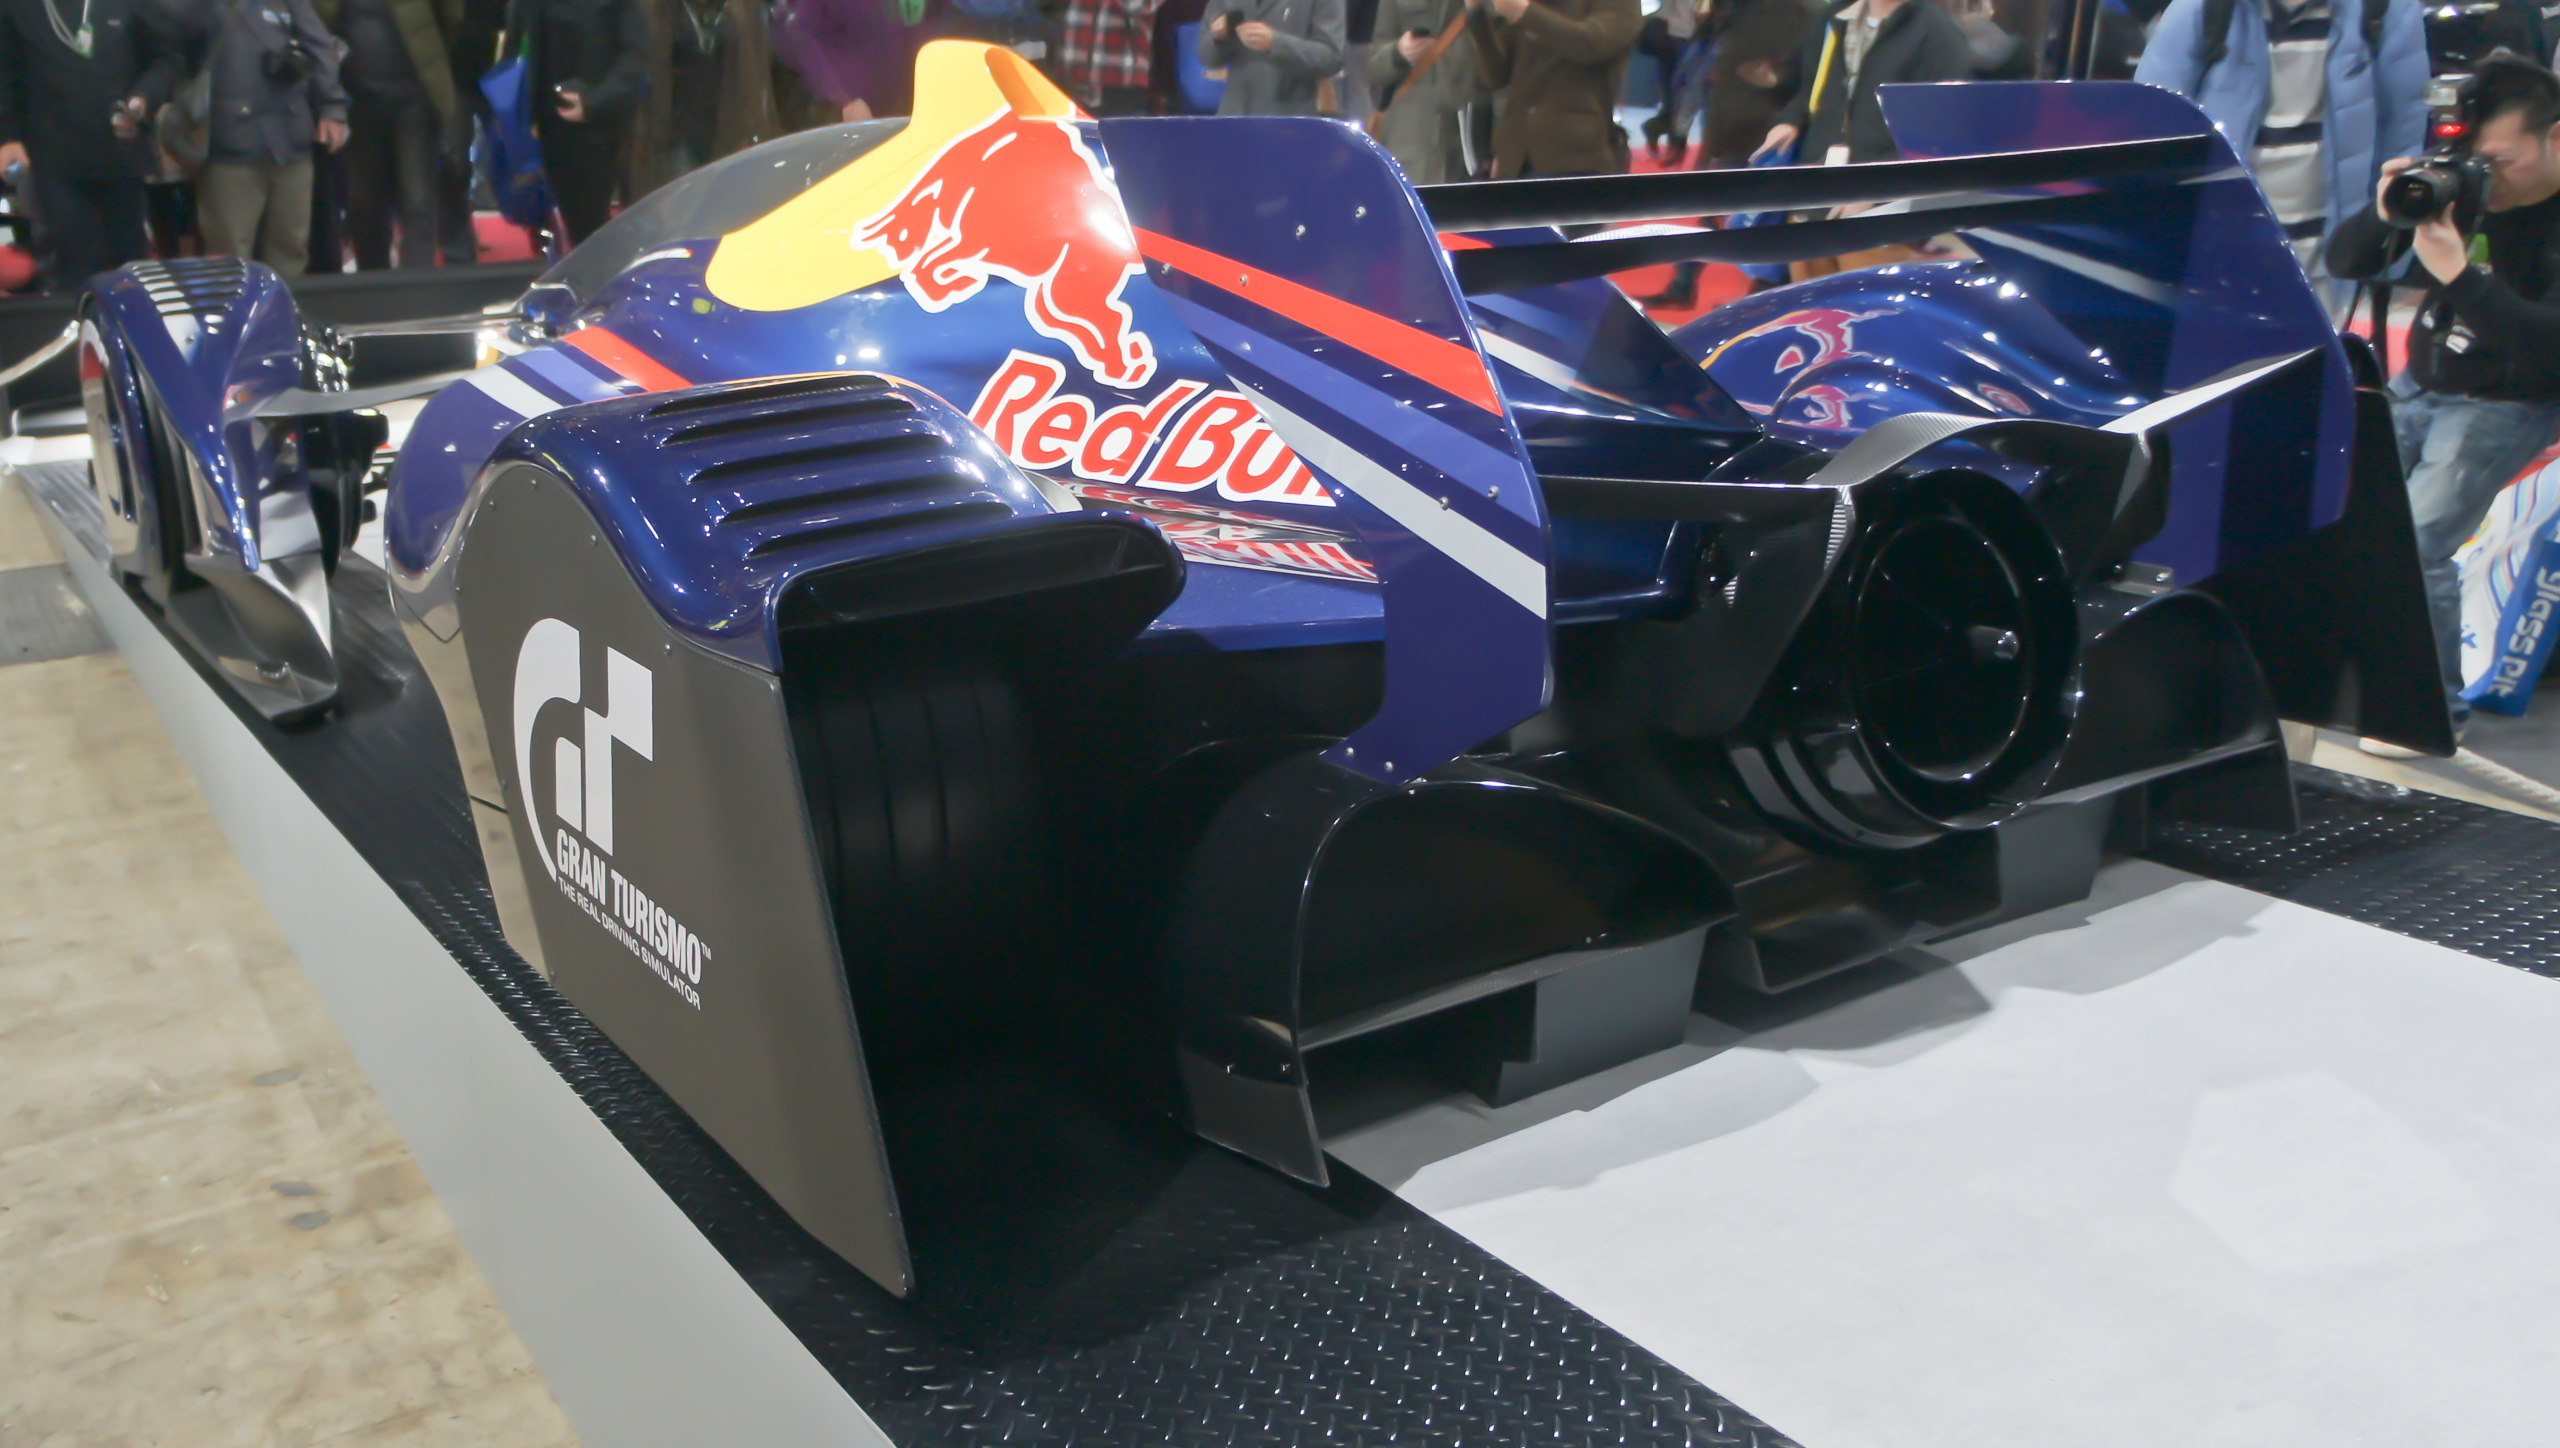 File:Red Bull X2010 rear 2012 Tokyo Auto Salon.jpg - Wikimedia Commons